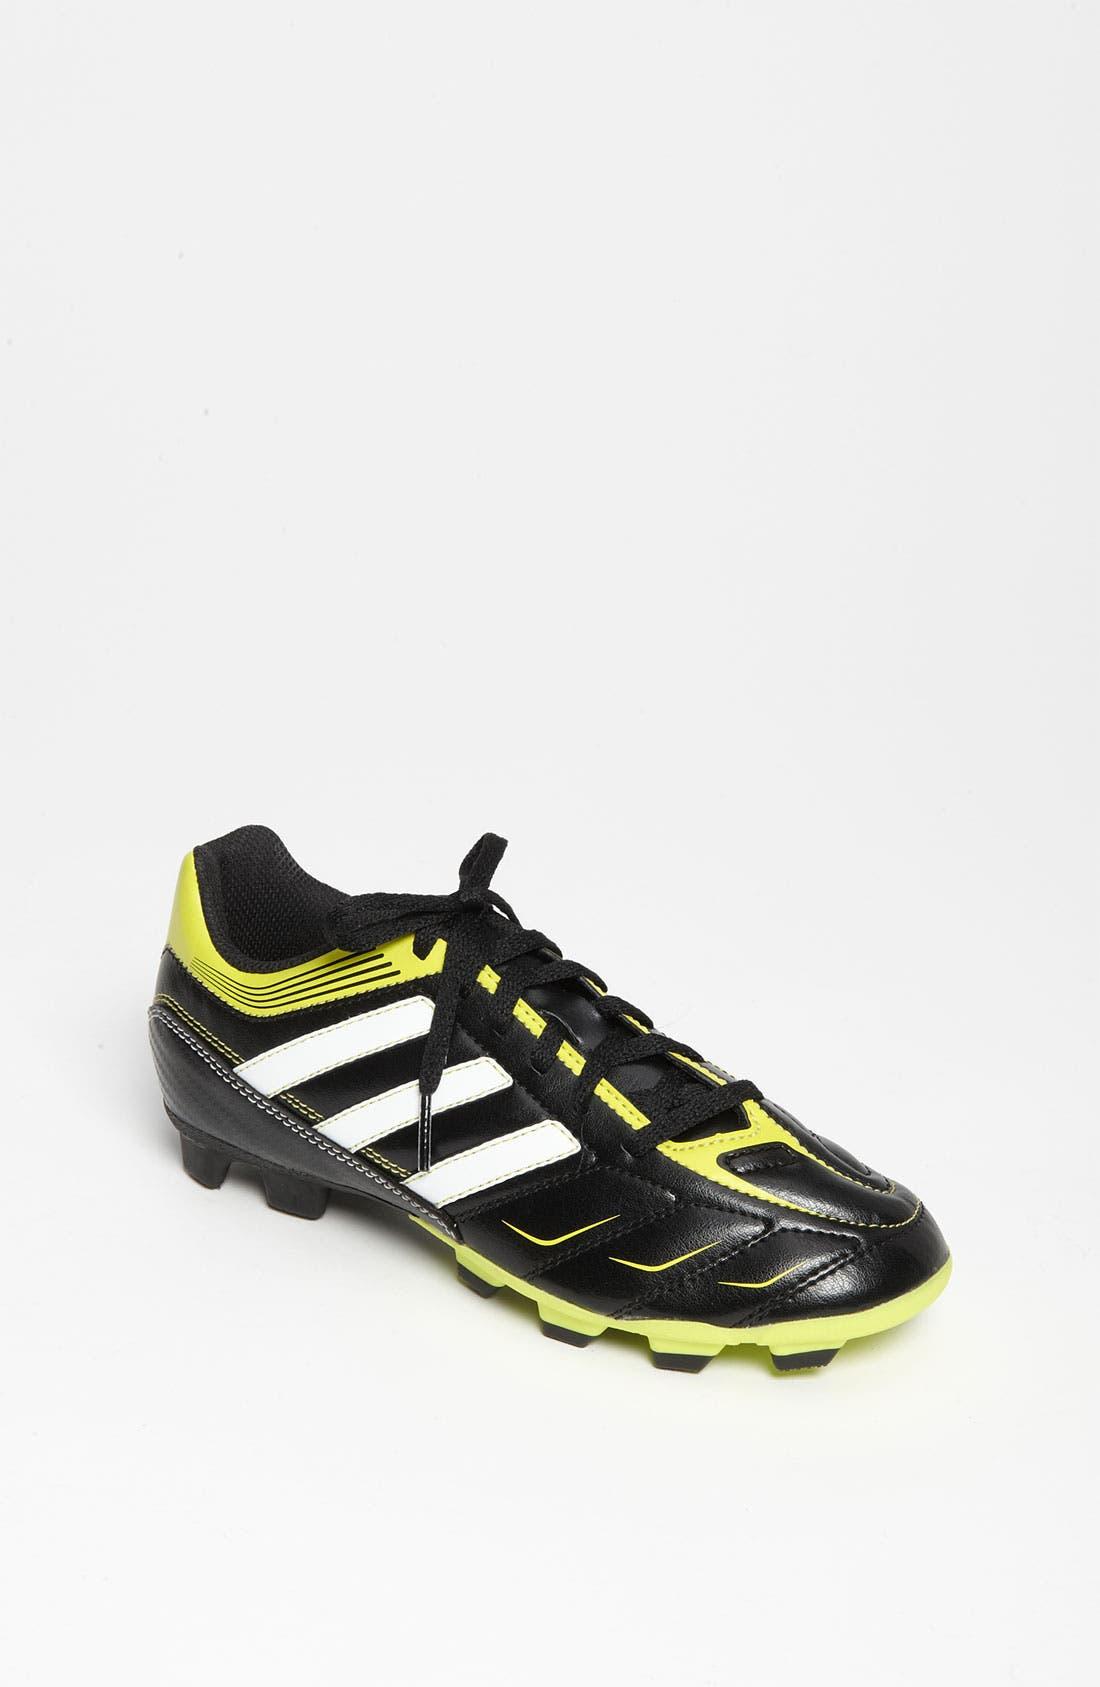 Alternate Image 1 Selected - adidas 'Eziero' Soccer Shoe (Little Kid & Big Kid)